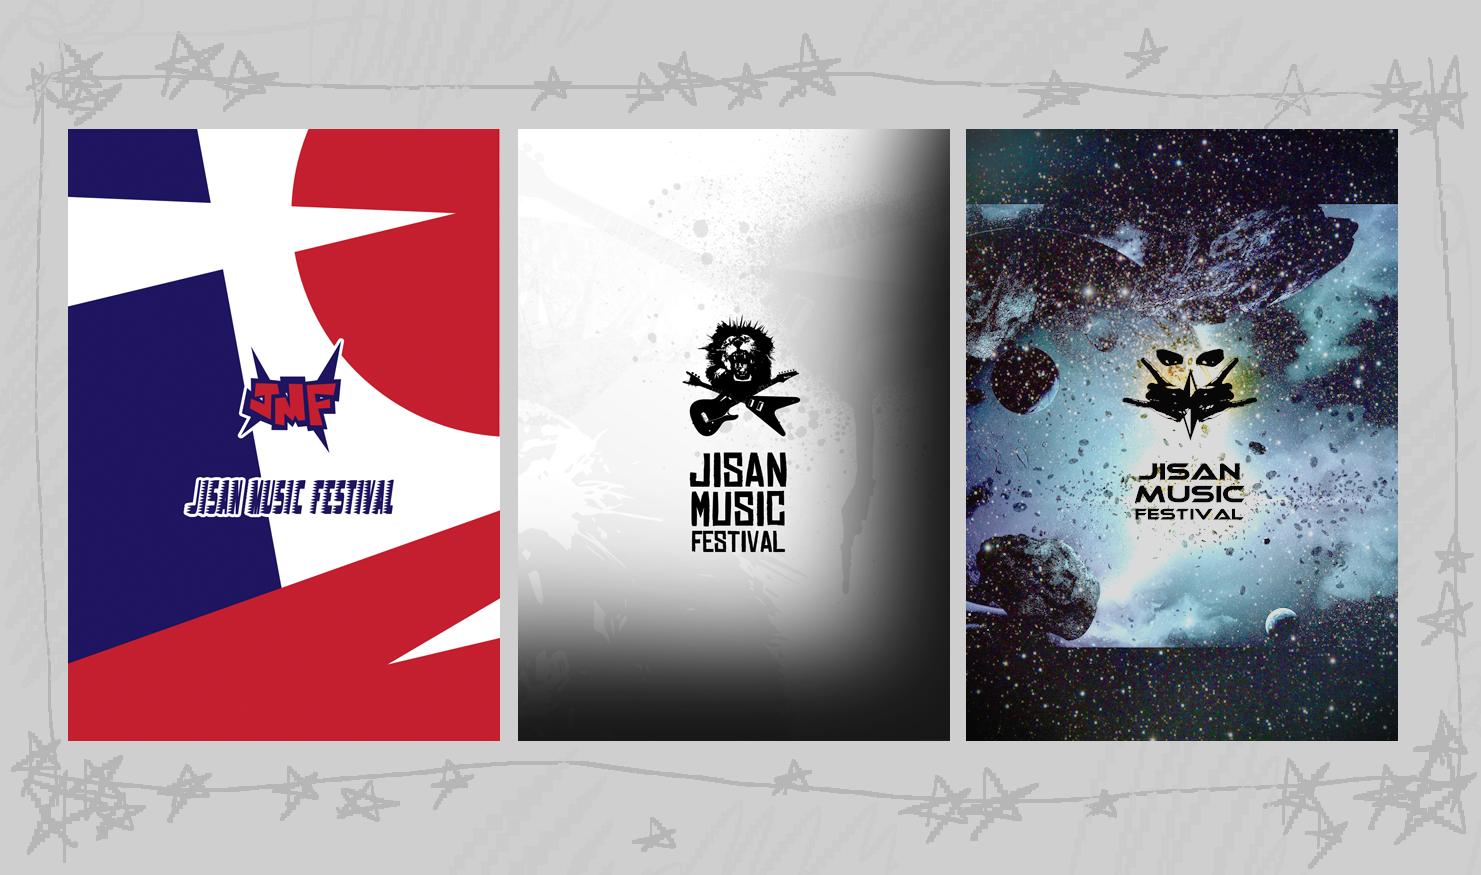 Jisan Music Festival